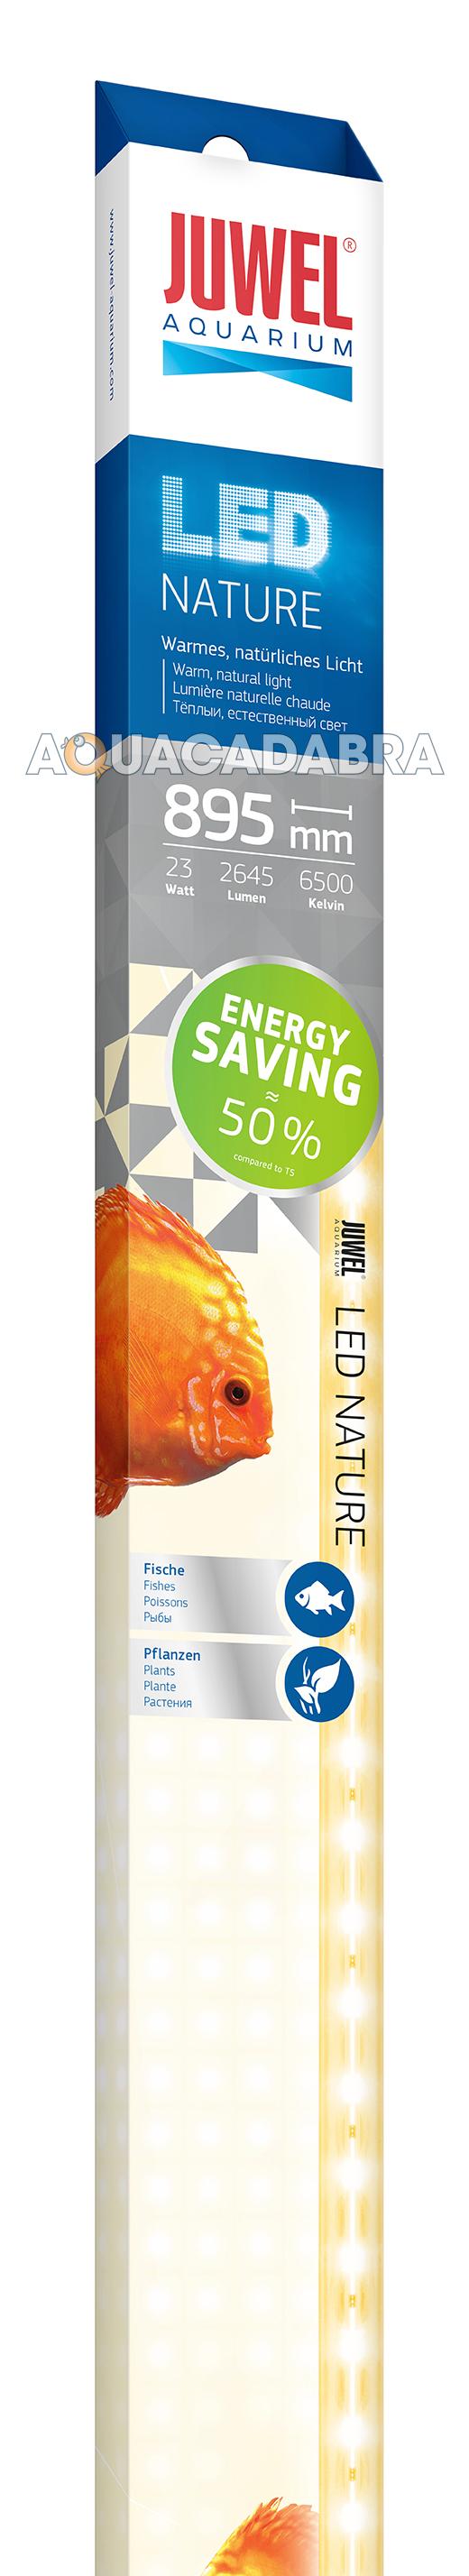 Fish & Aquarium Realistic Juwel Led Marine Multilux Bulb Light White Coral Reef Growth Aquarium Tank